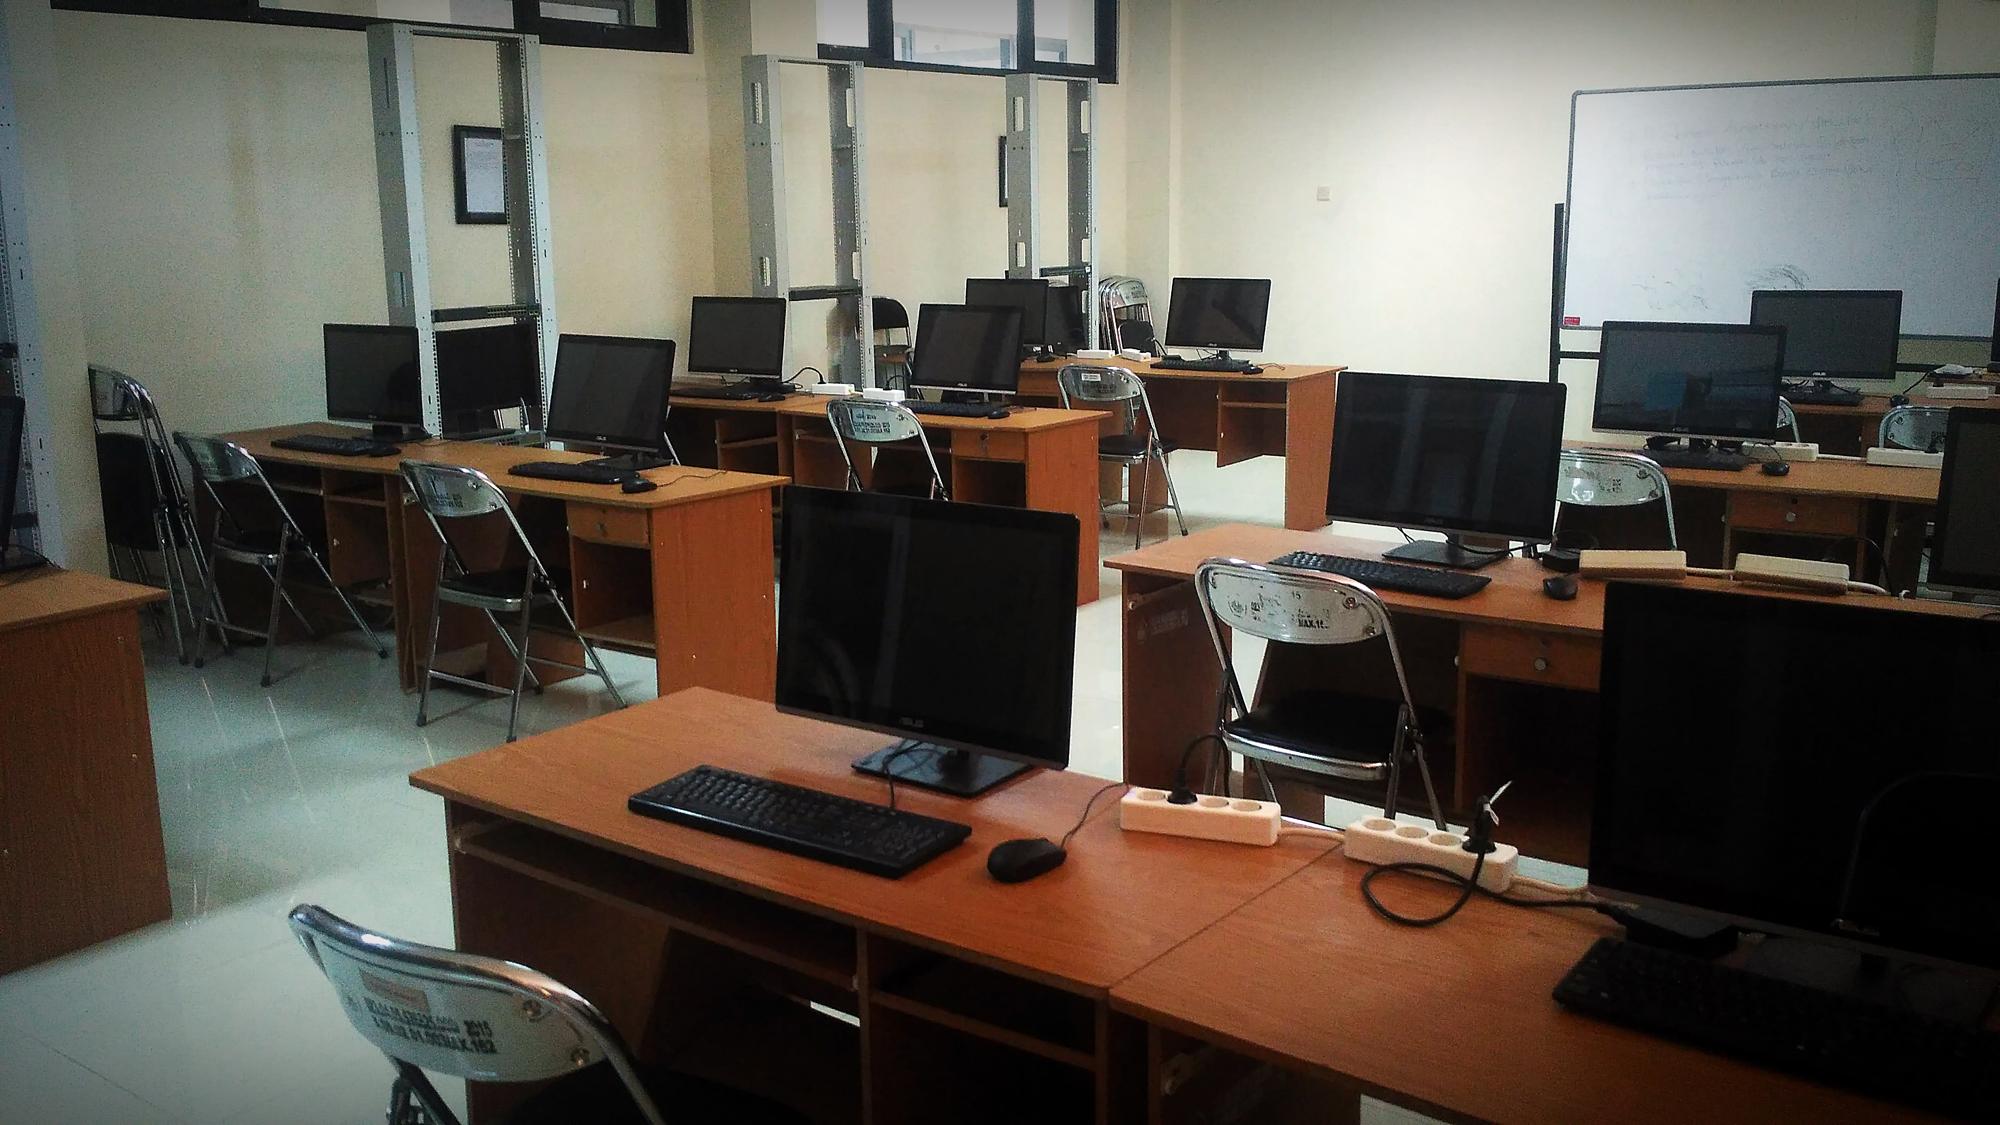 Laboratorium Arsitektur dan Jaringan Komputer